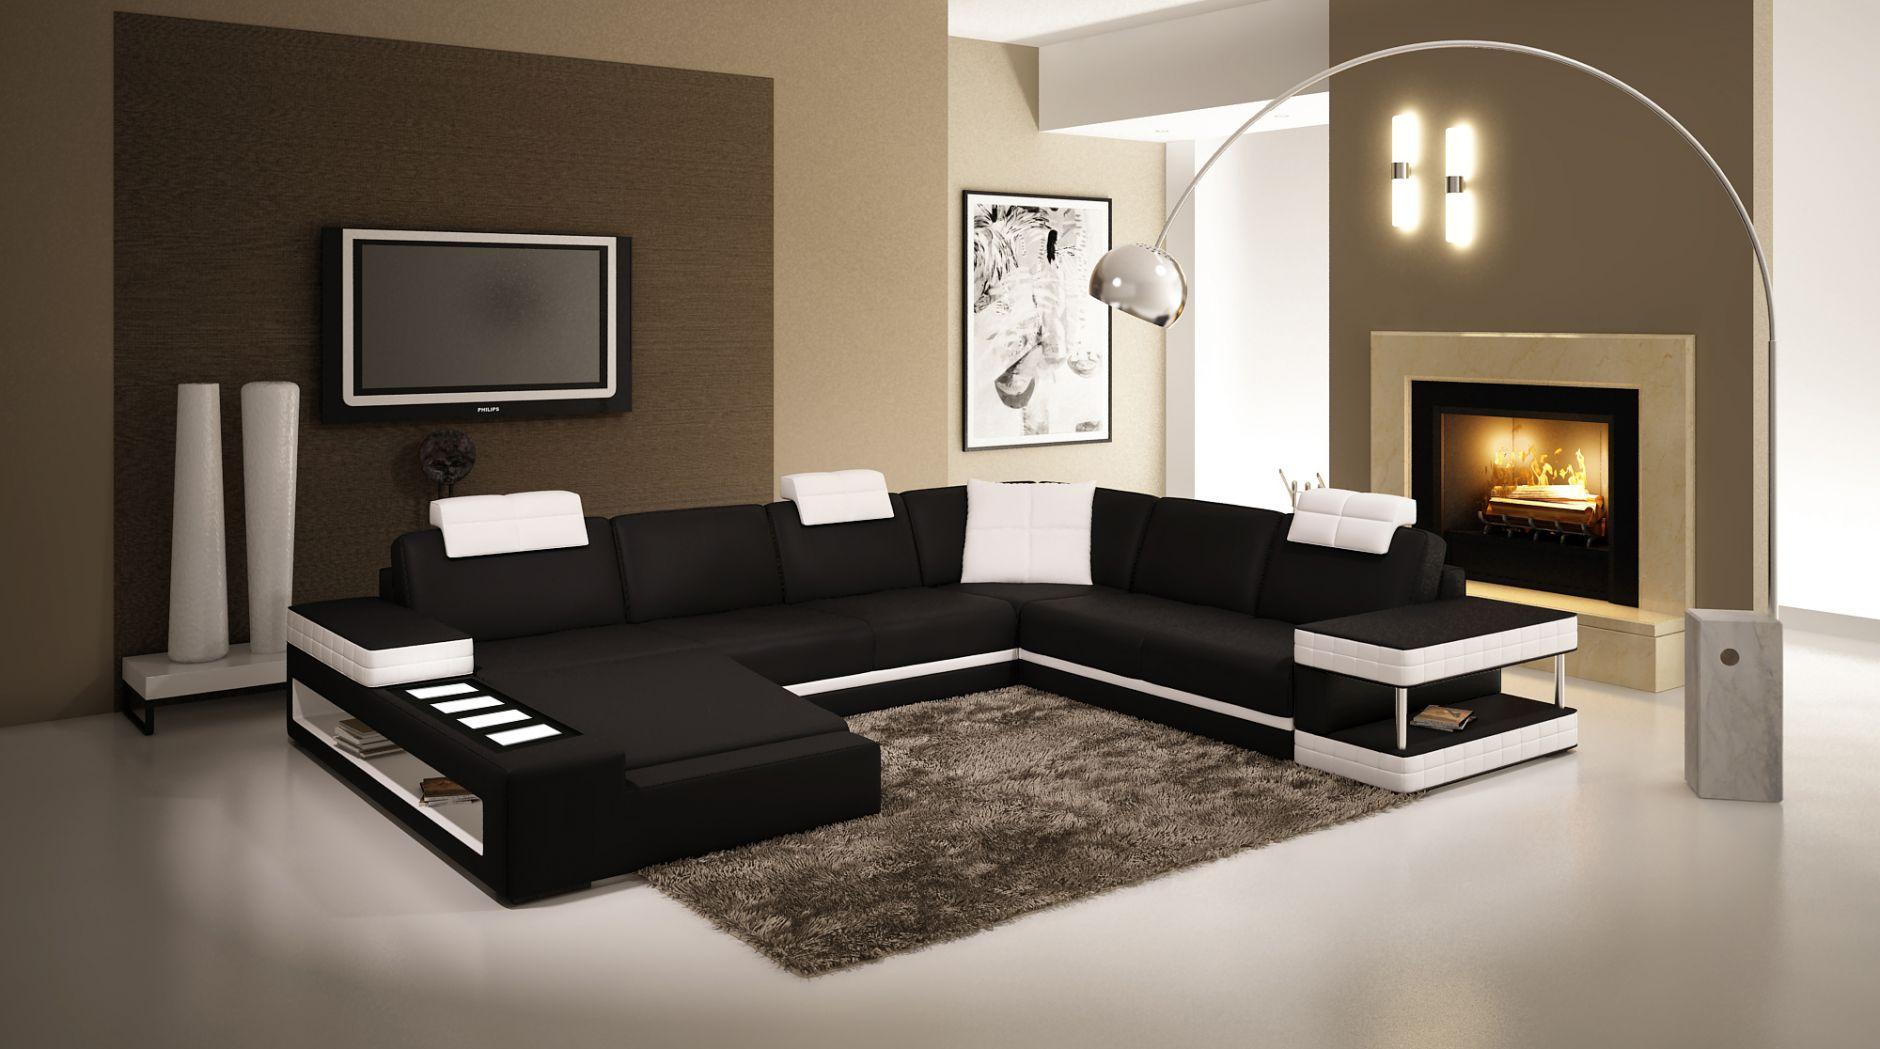 schnittsofa schnittsofa modell 5035die m bel aus italien. Black Bedroom Furniture Sets. Home Design Ideas